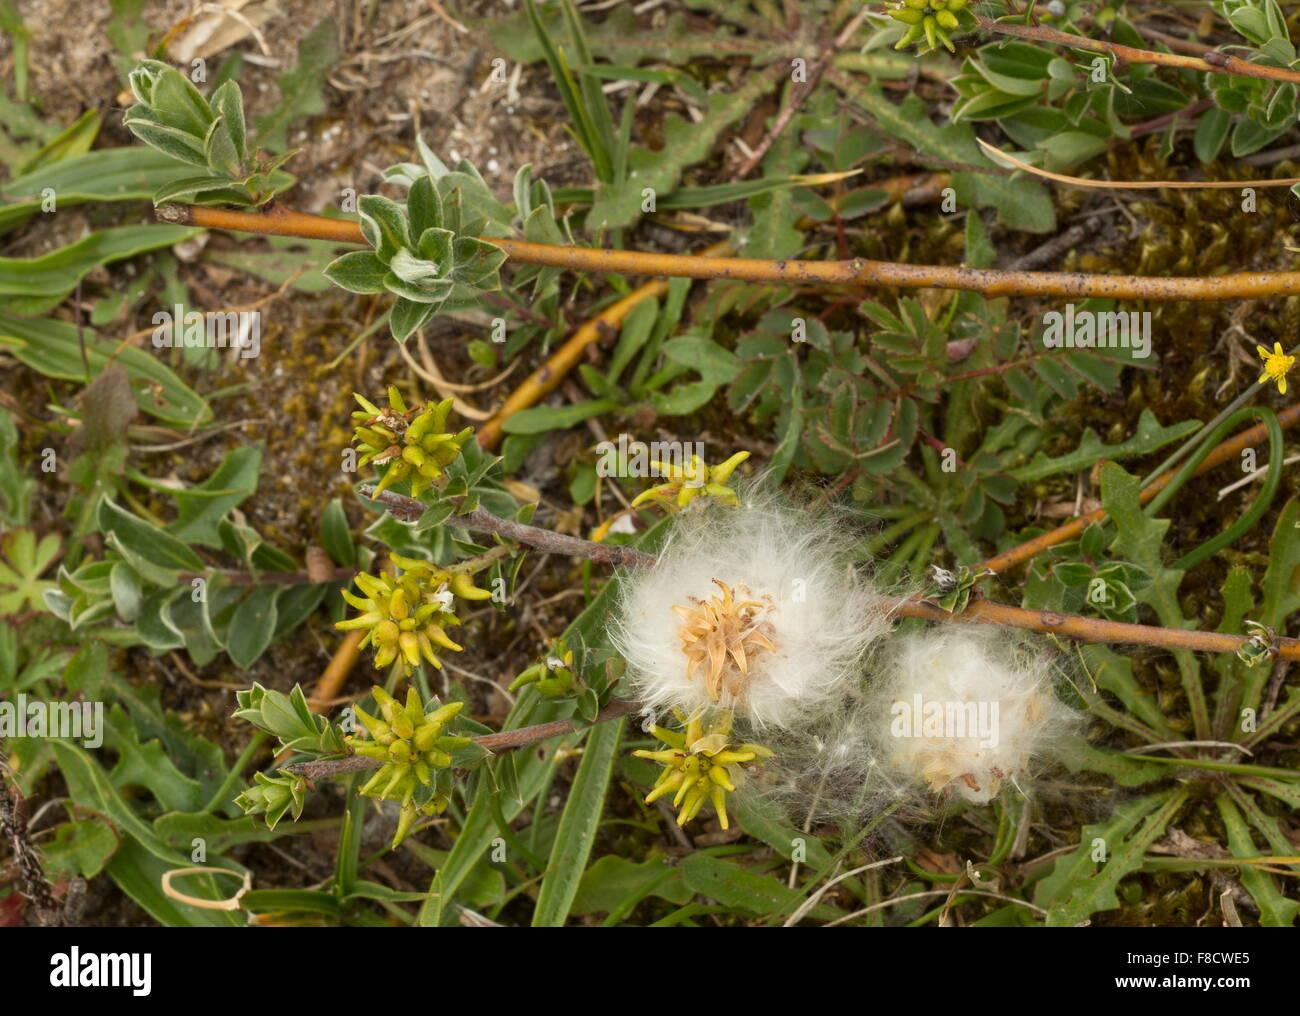 Creeping Willow, Salix repens in fruit, in damp dune-slack. - Stock Image